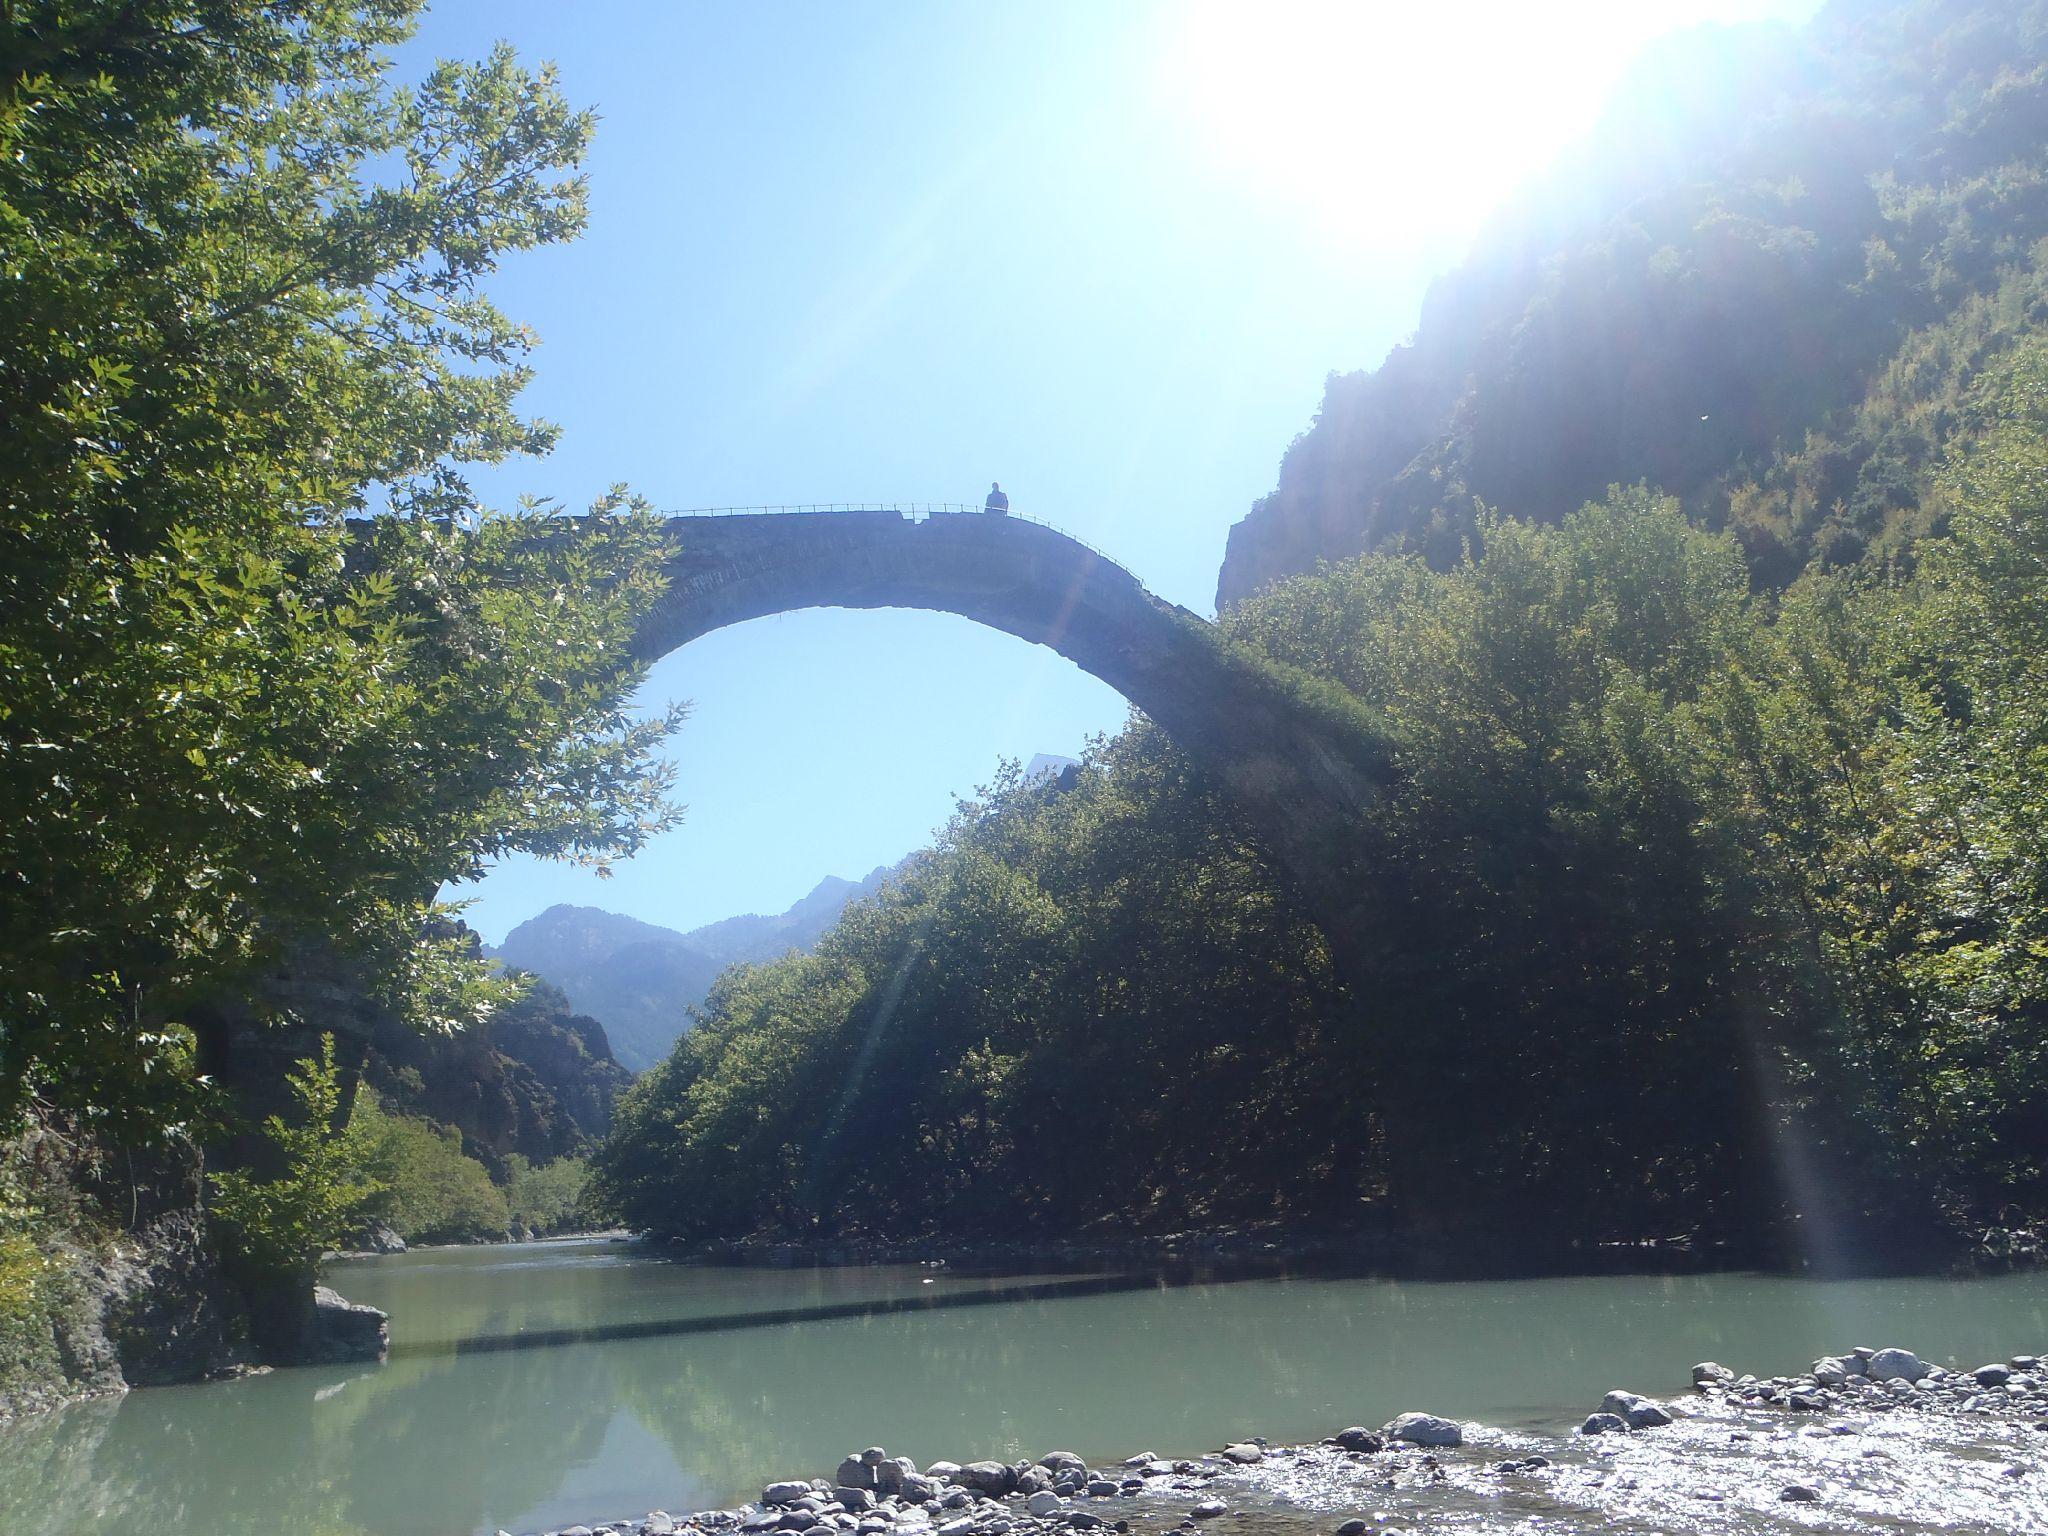 grèce proche macédoine pont romain